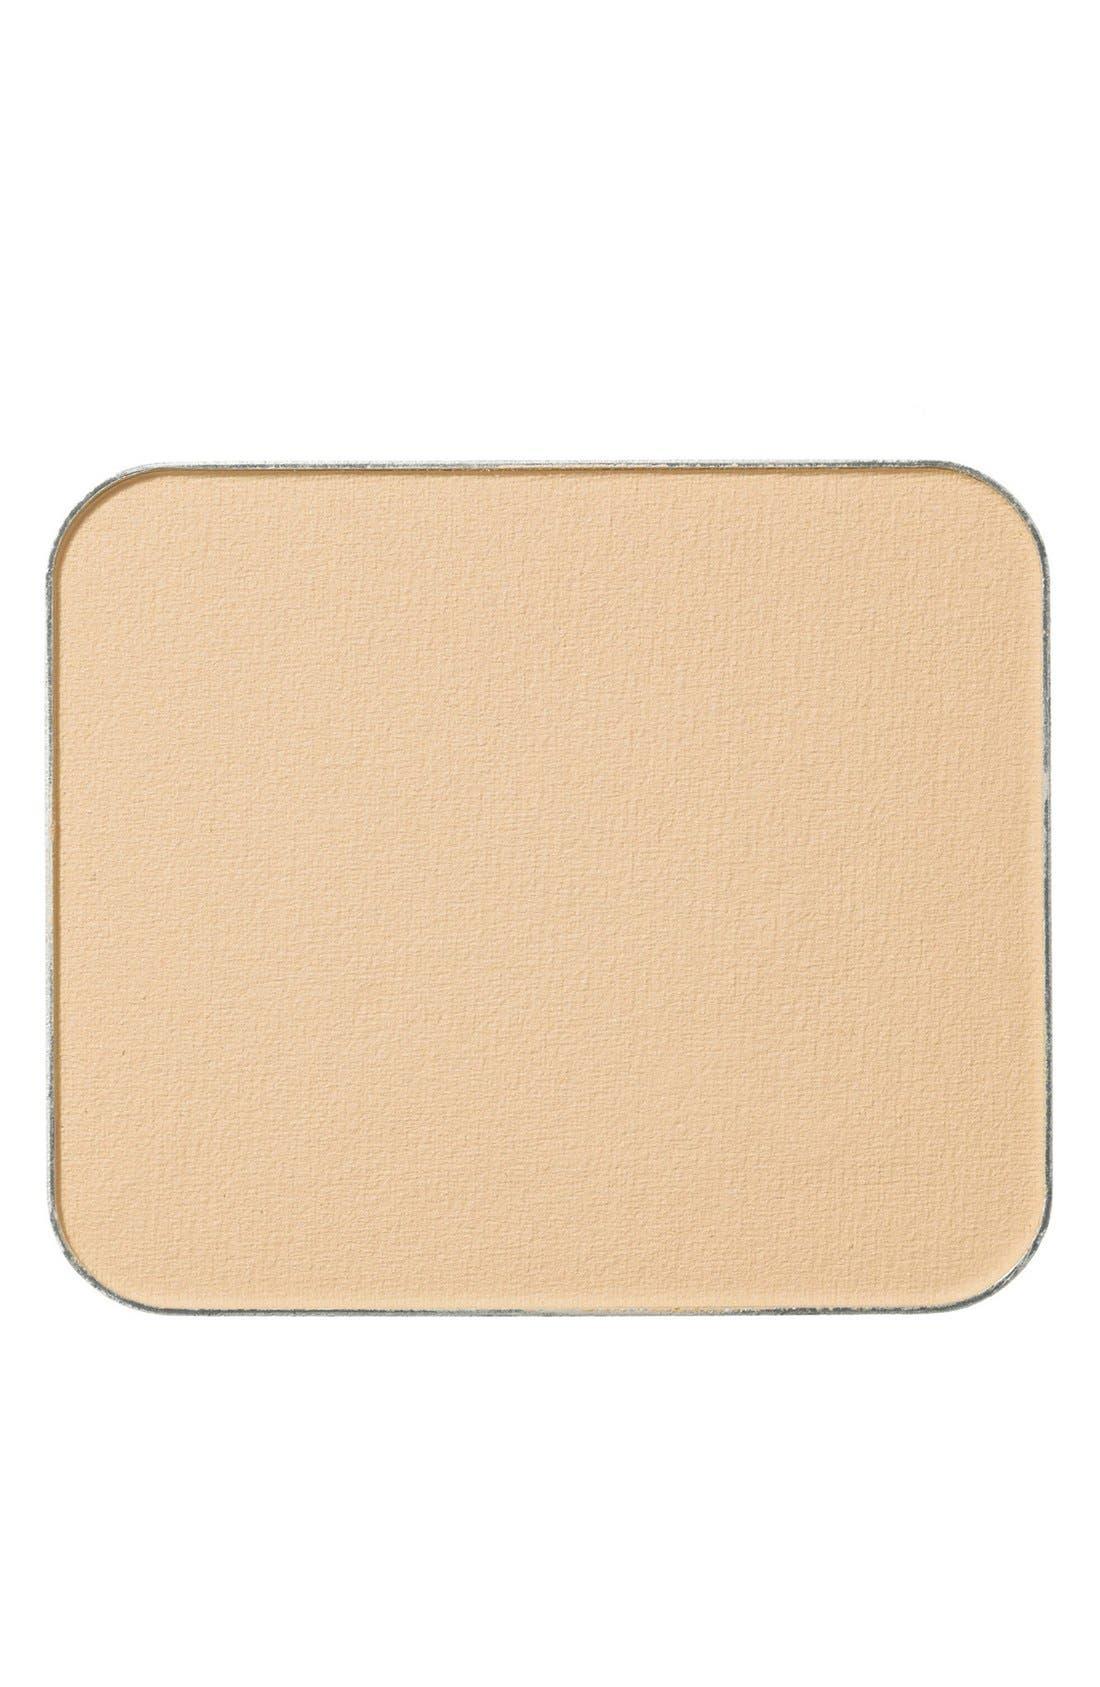 Koh Gen Do 'Maifanshi' Silky Moisture Powder Compact Refill